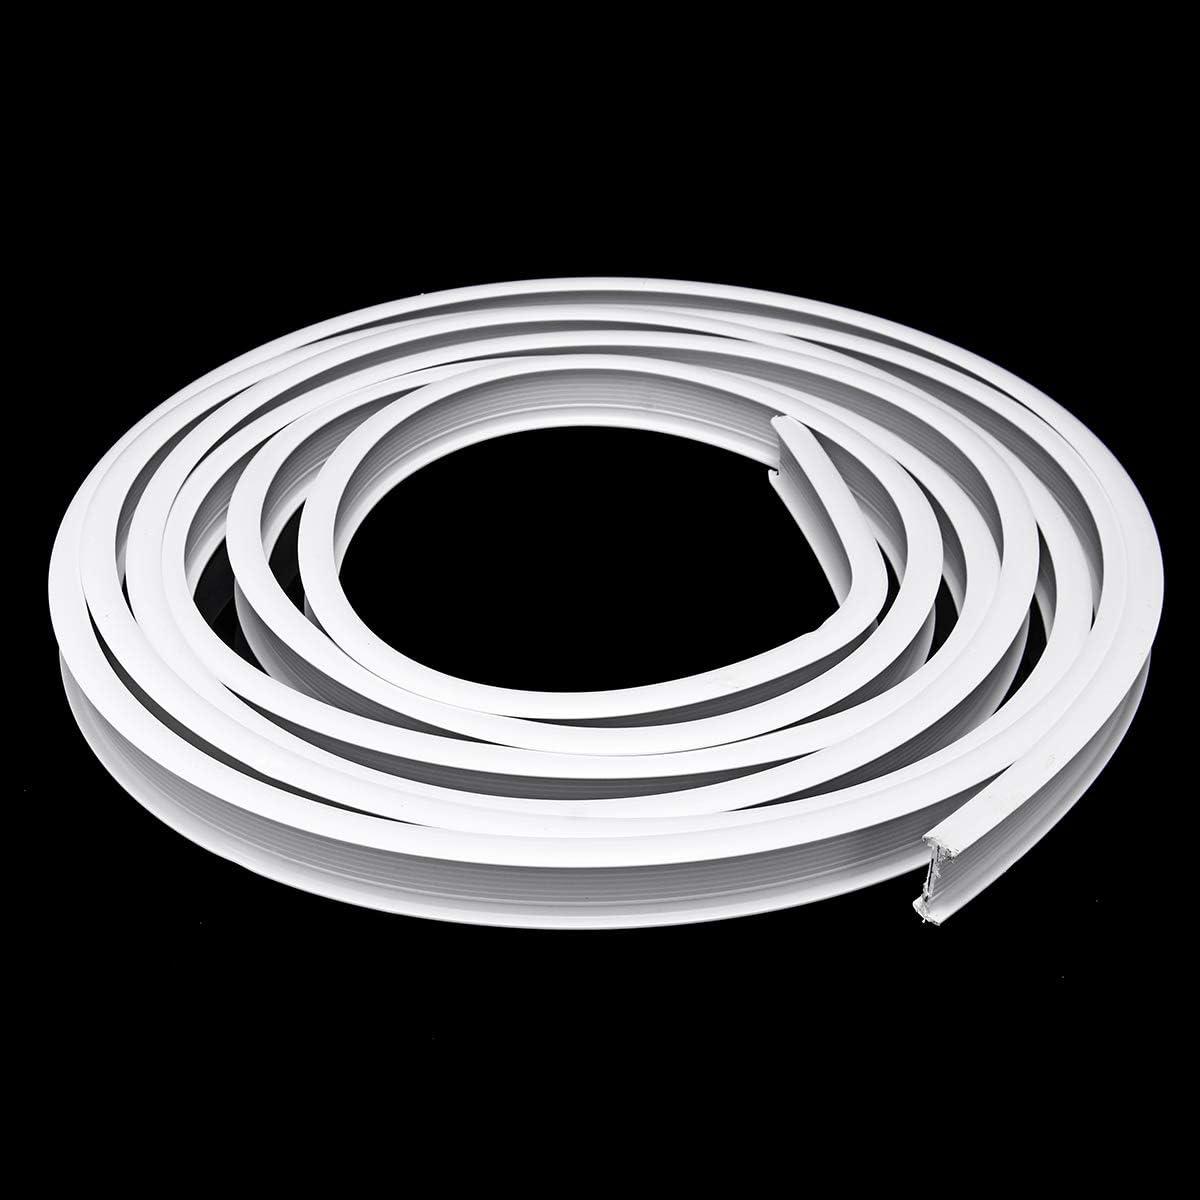 Riel para Cortina Color Blanco 10 m 10 m, pl/ástico, Flexible TOPWA Side Clamping